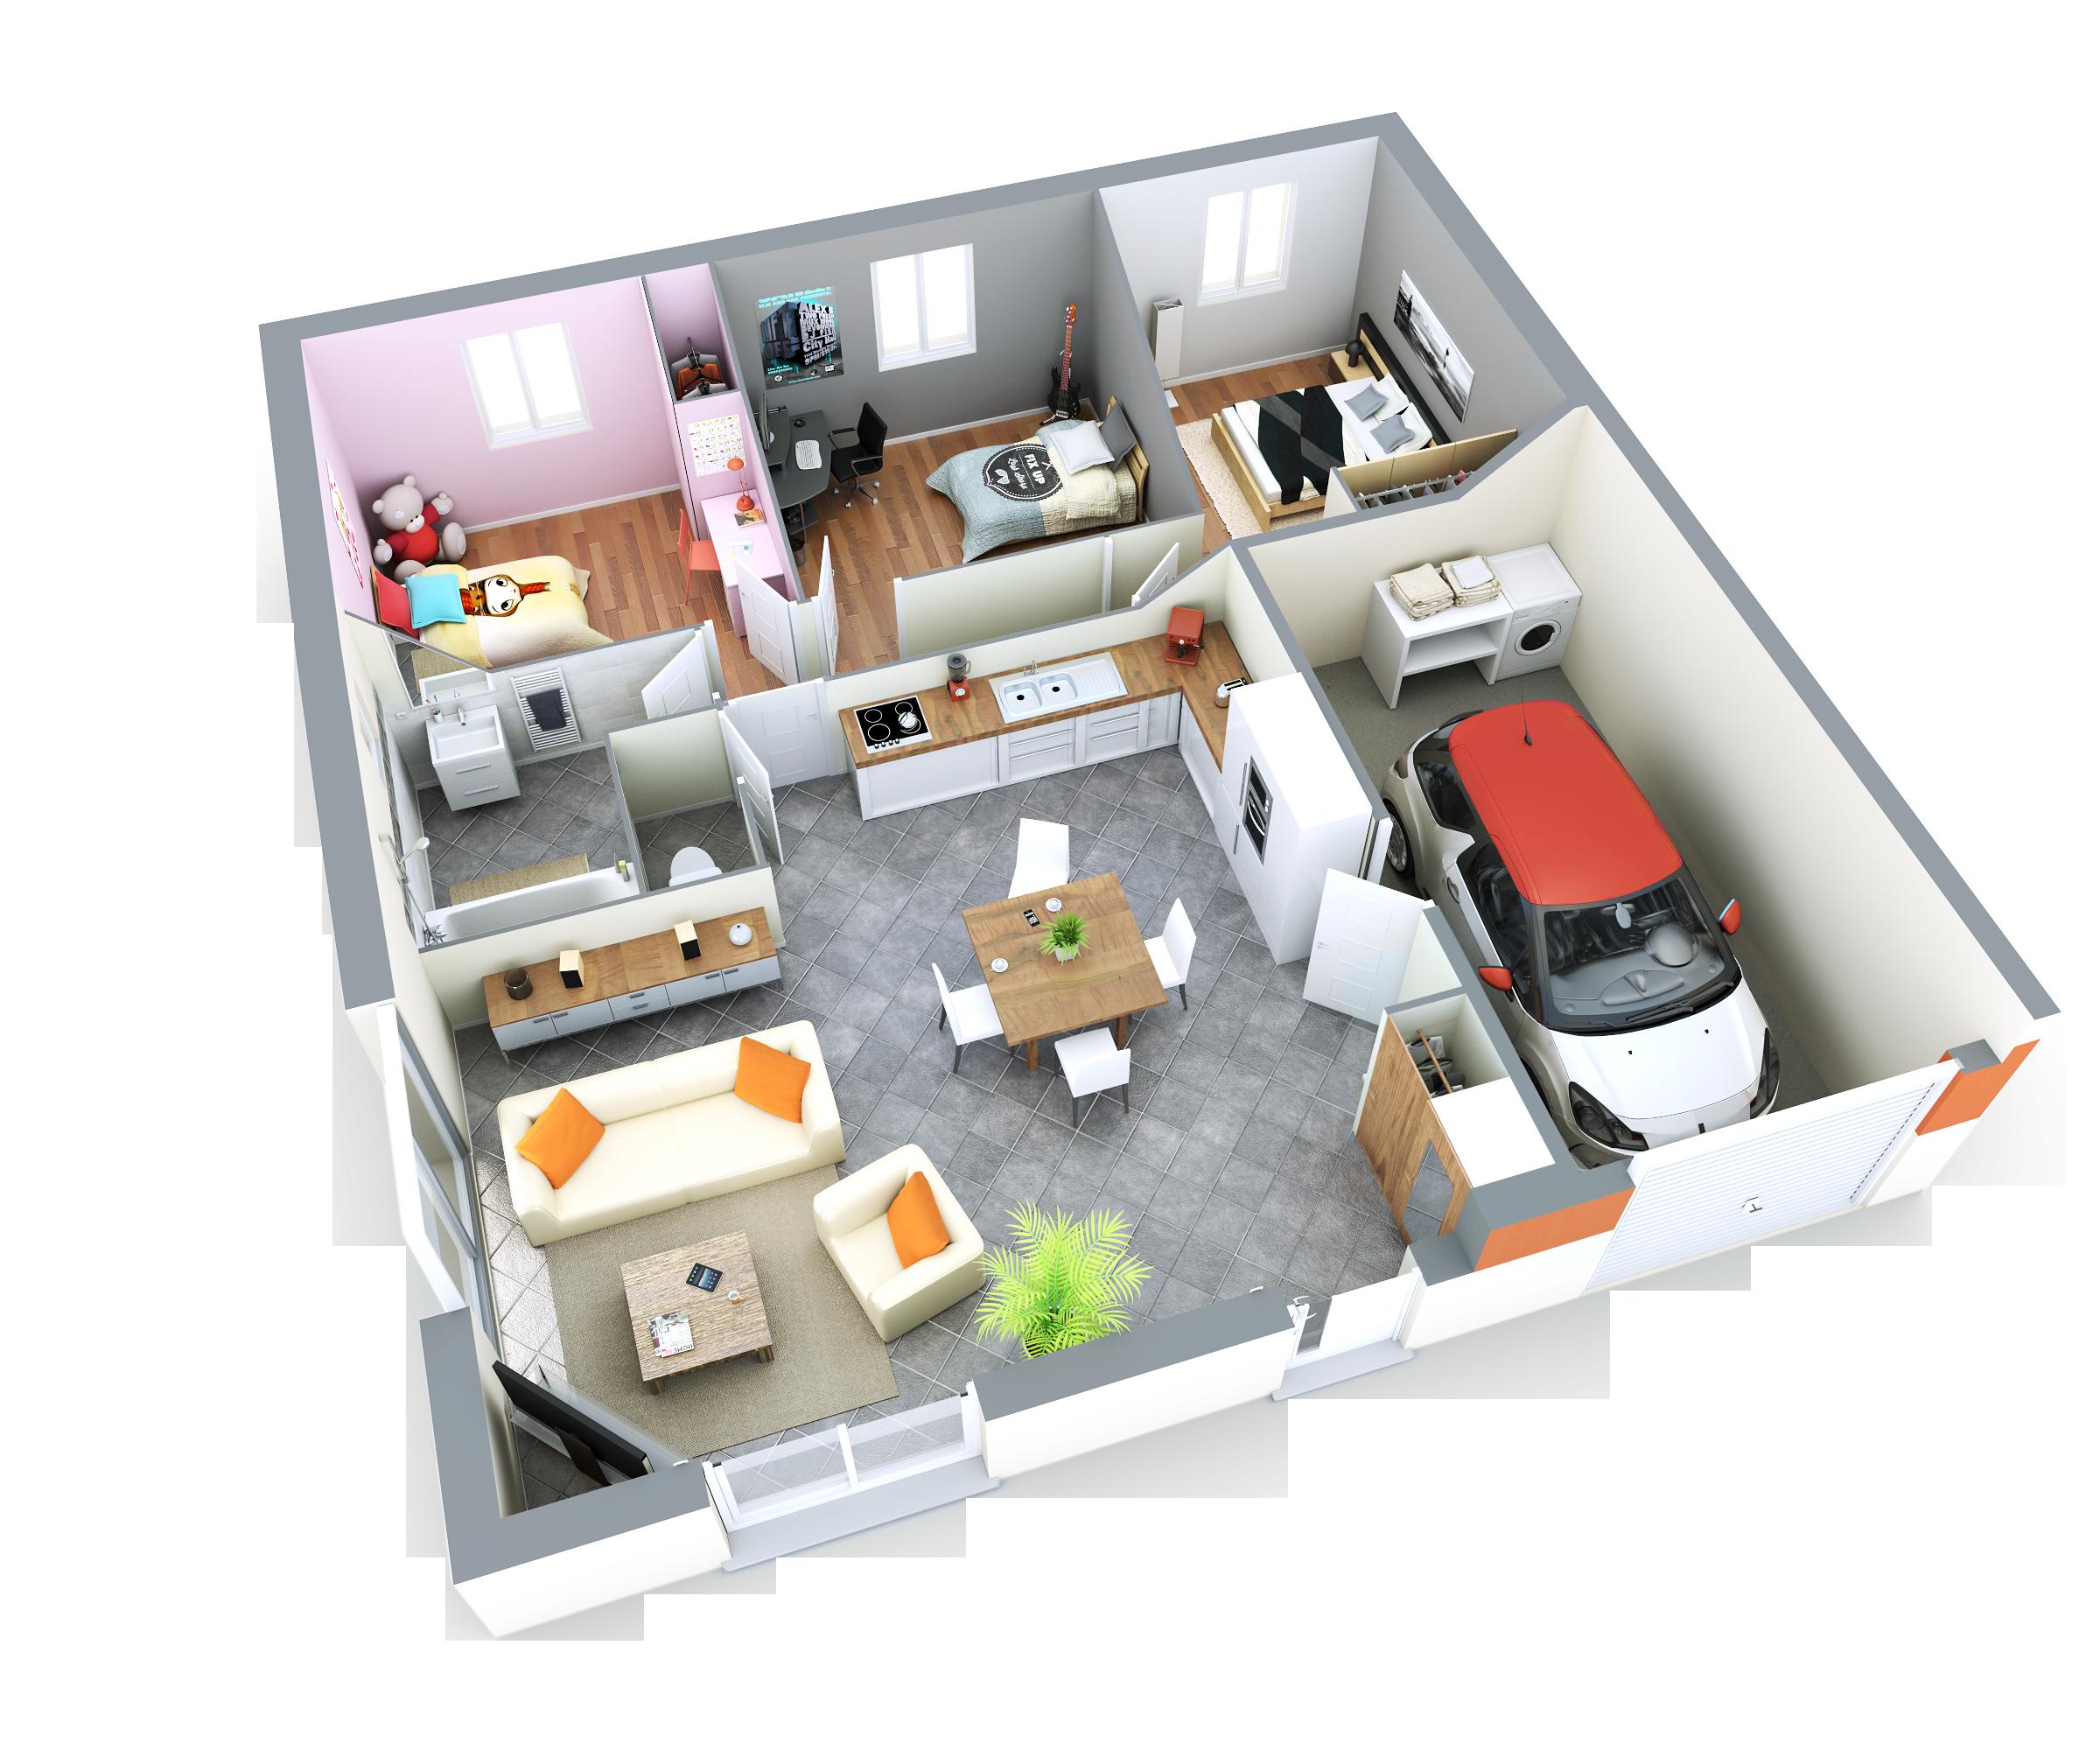 top duo groupe ast constructeur immobilier dijon 21000 immobilier 21. Black Bedroom Furniture Sets. Home Design Ideas